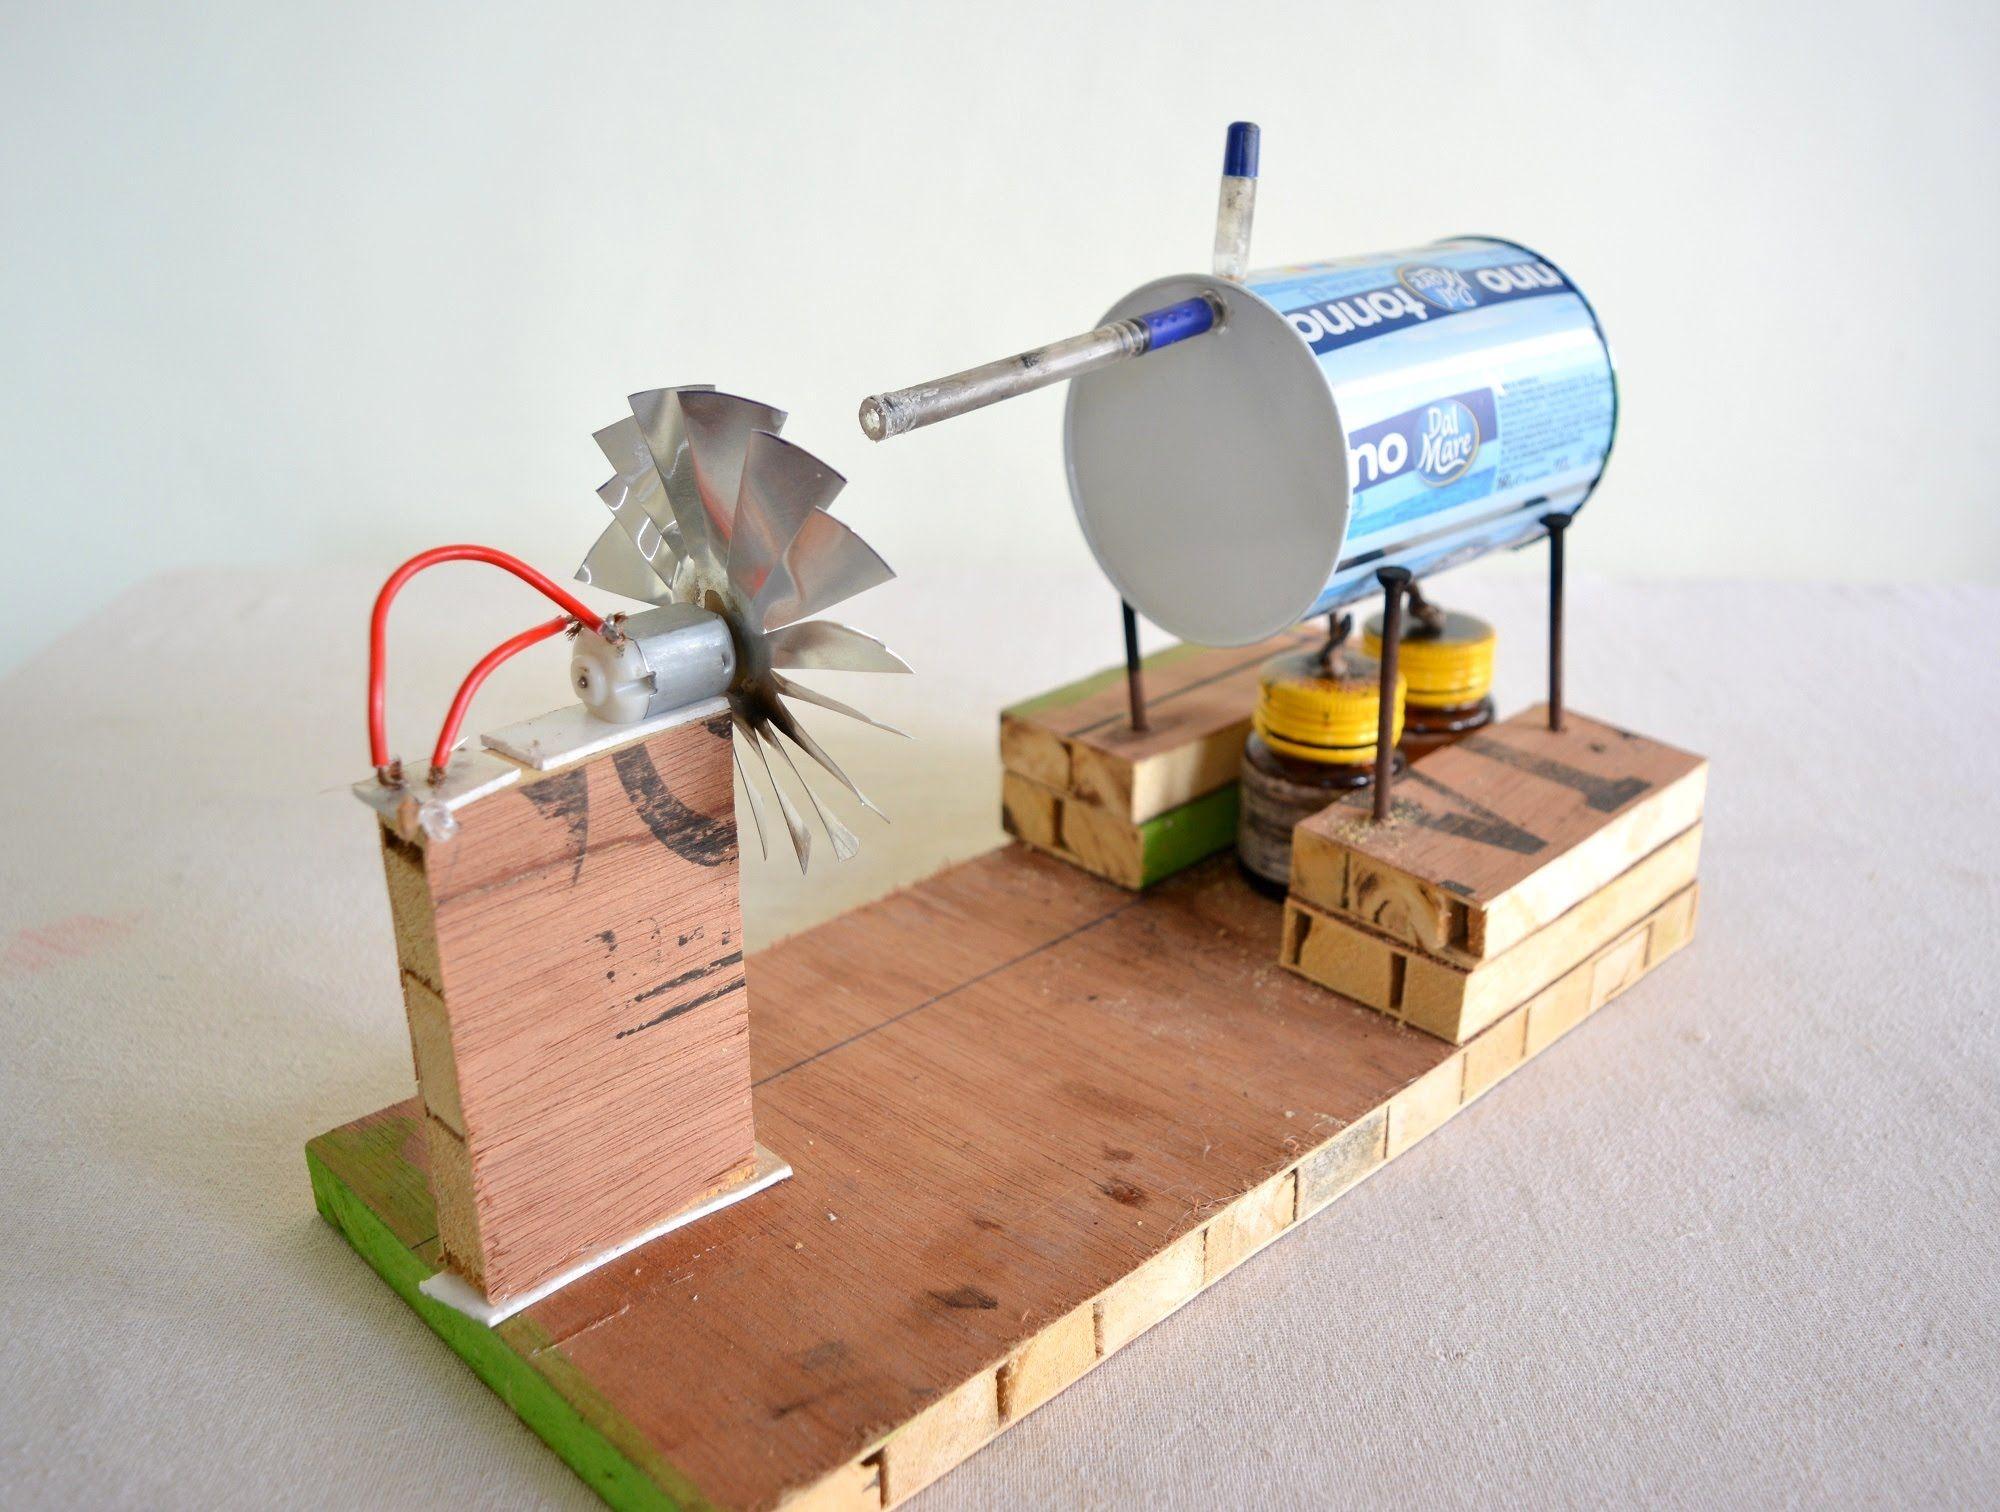 Science steam power generator ffc6468c11ce6d12f4b2155f0d8be641